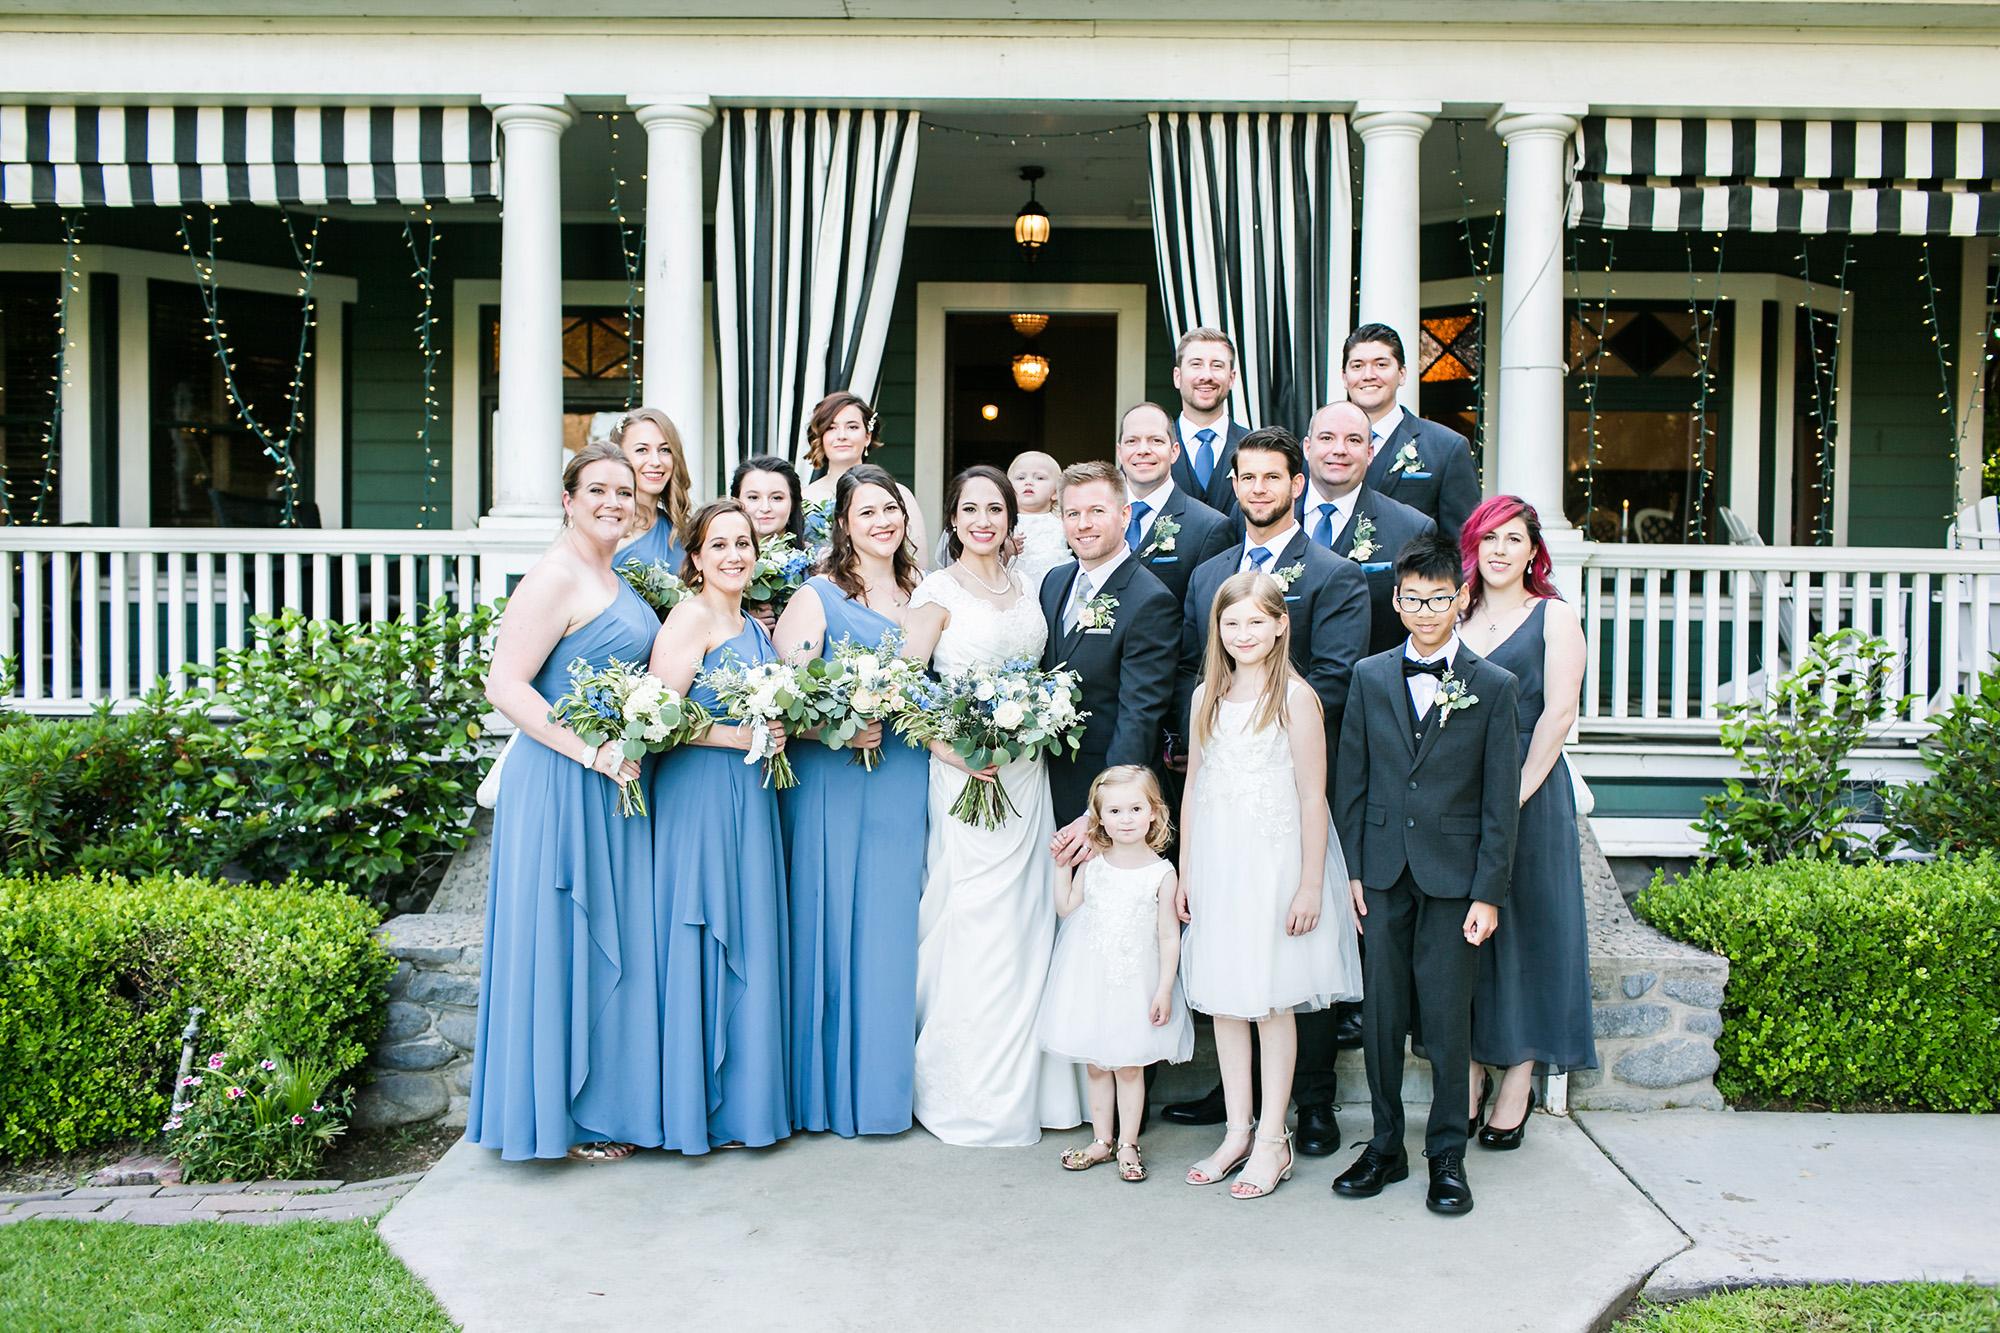 associate-photographer-christmas-house-wedding-carrie-vines-0134.jpg